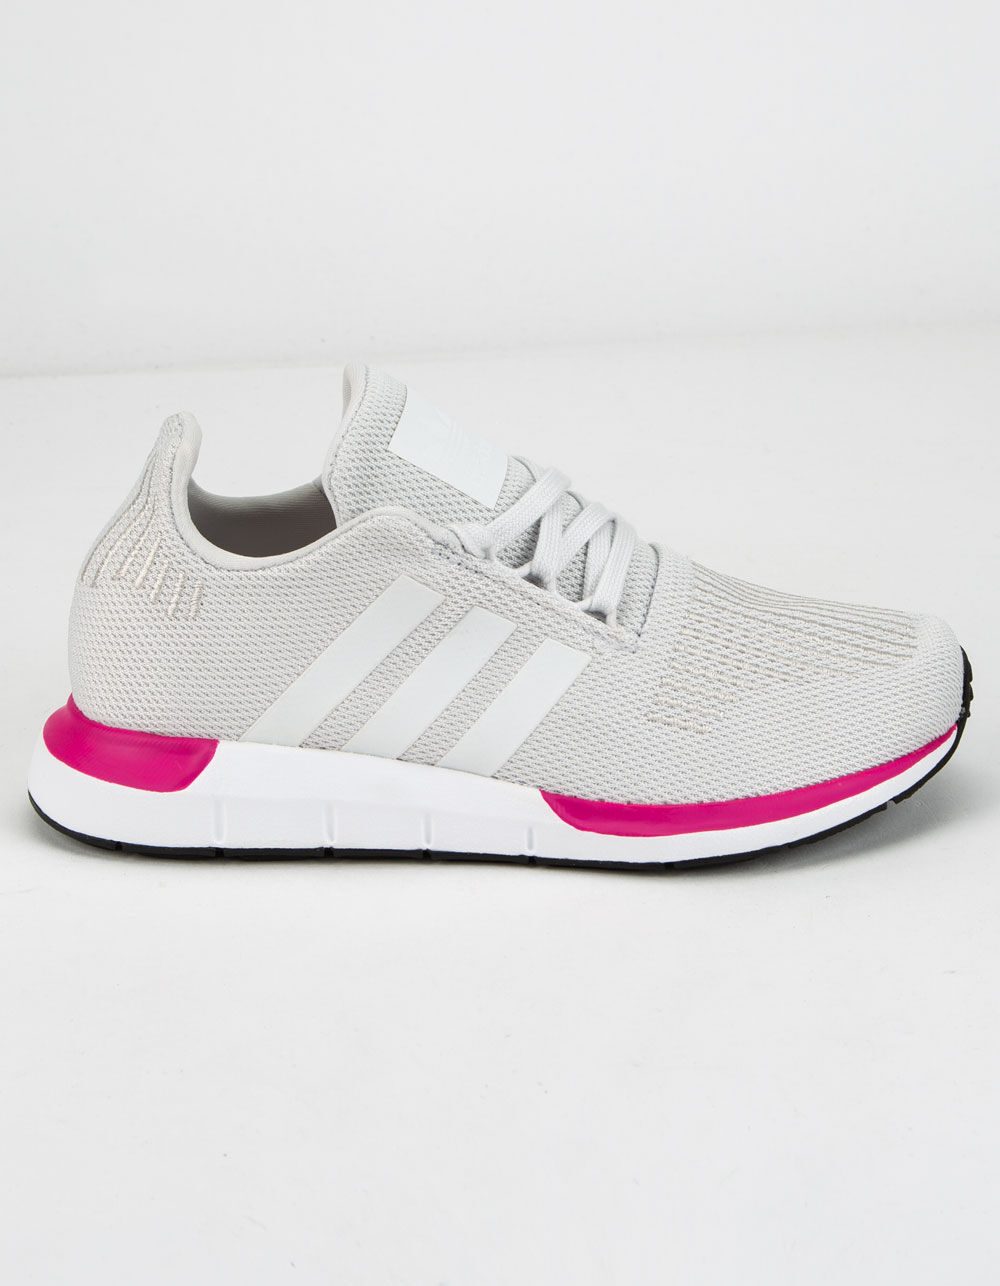 ADIDAS Swift Run Girls Shoes